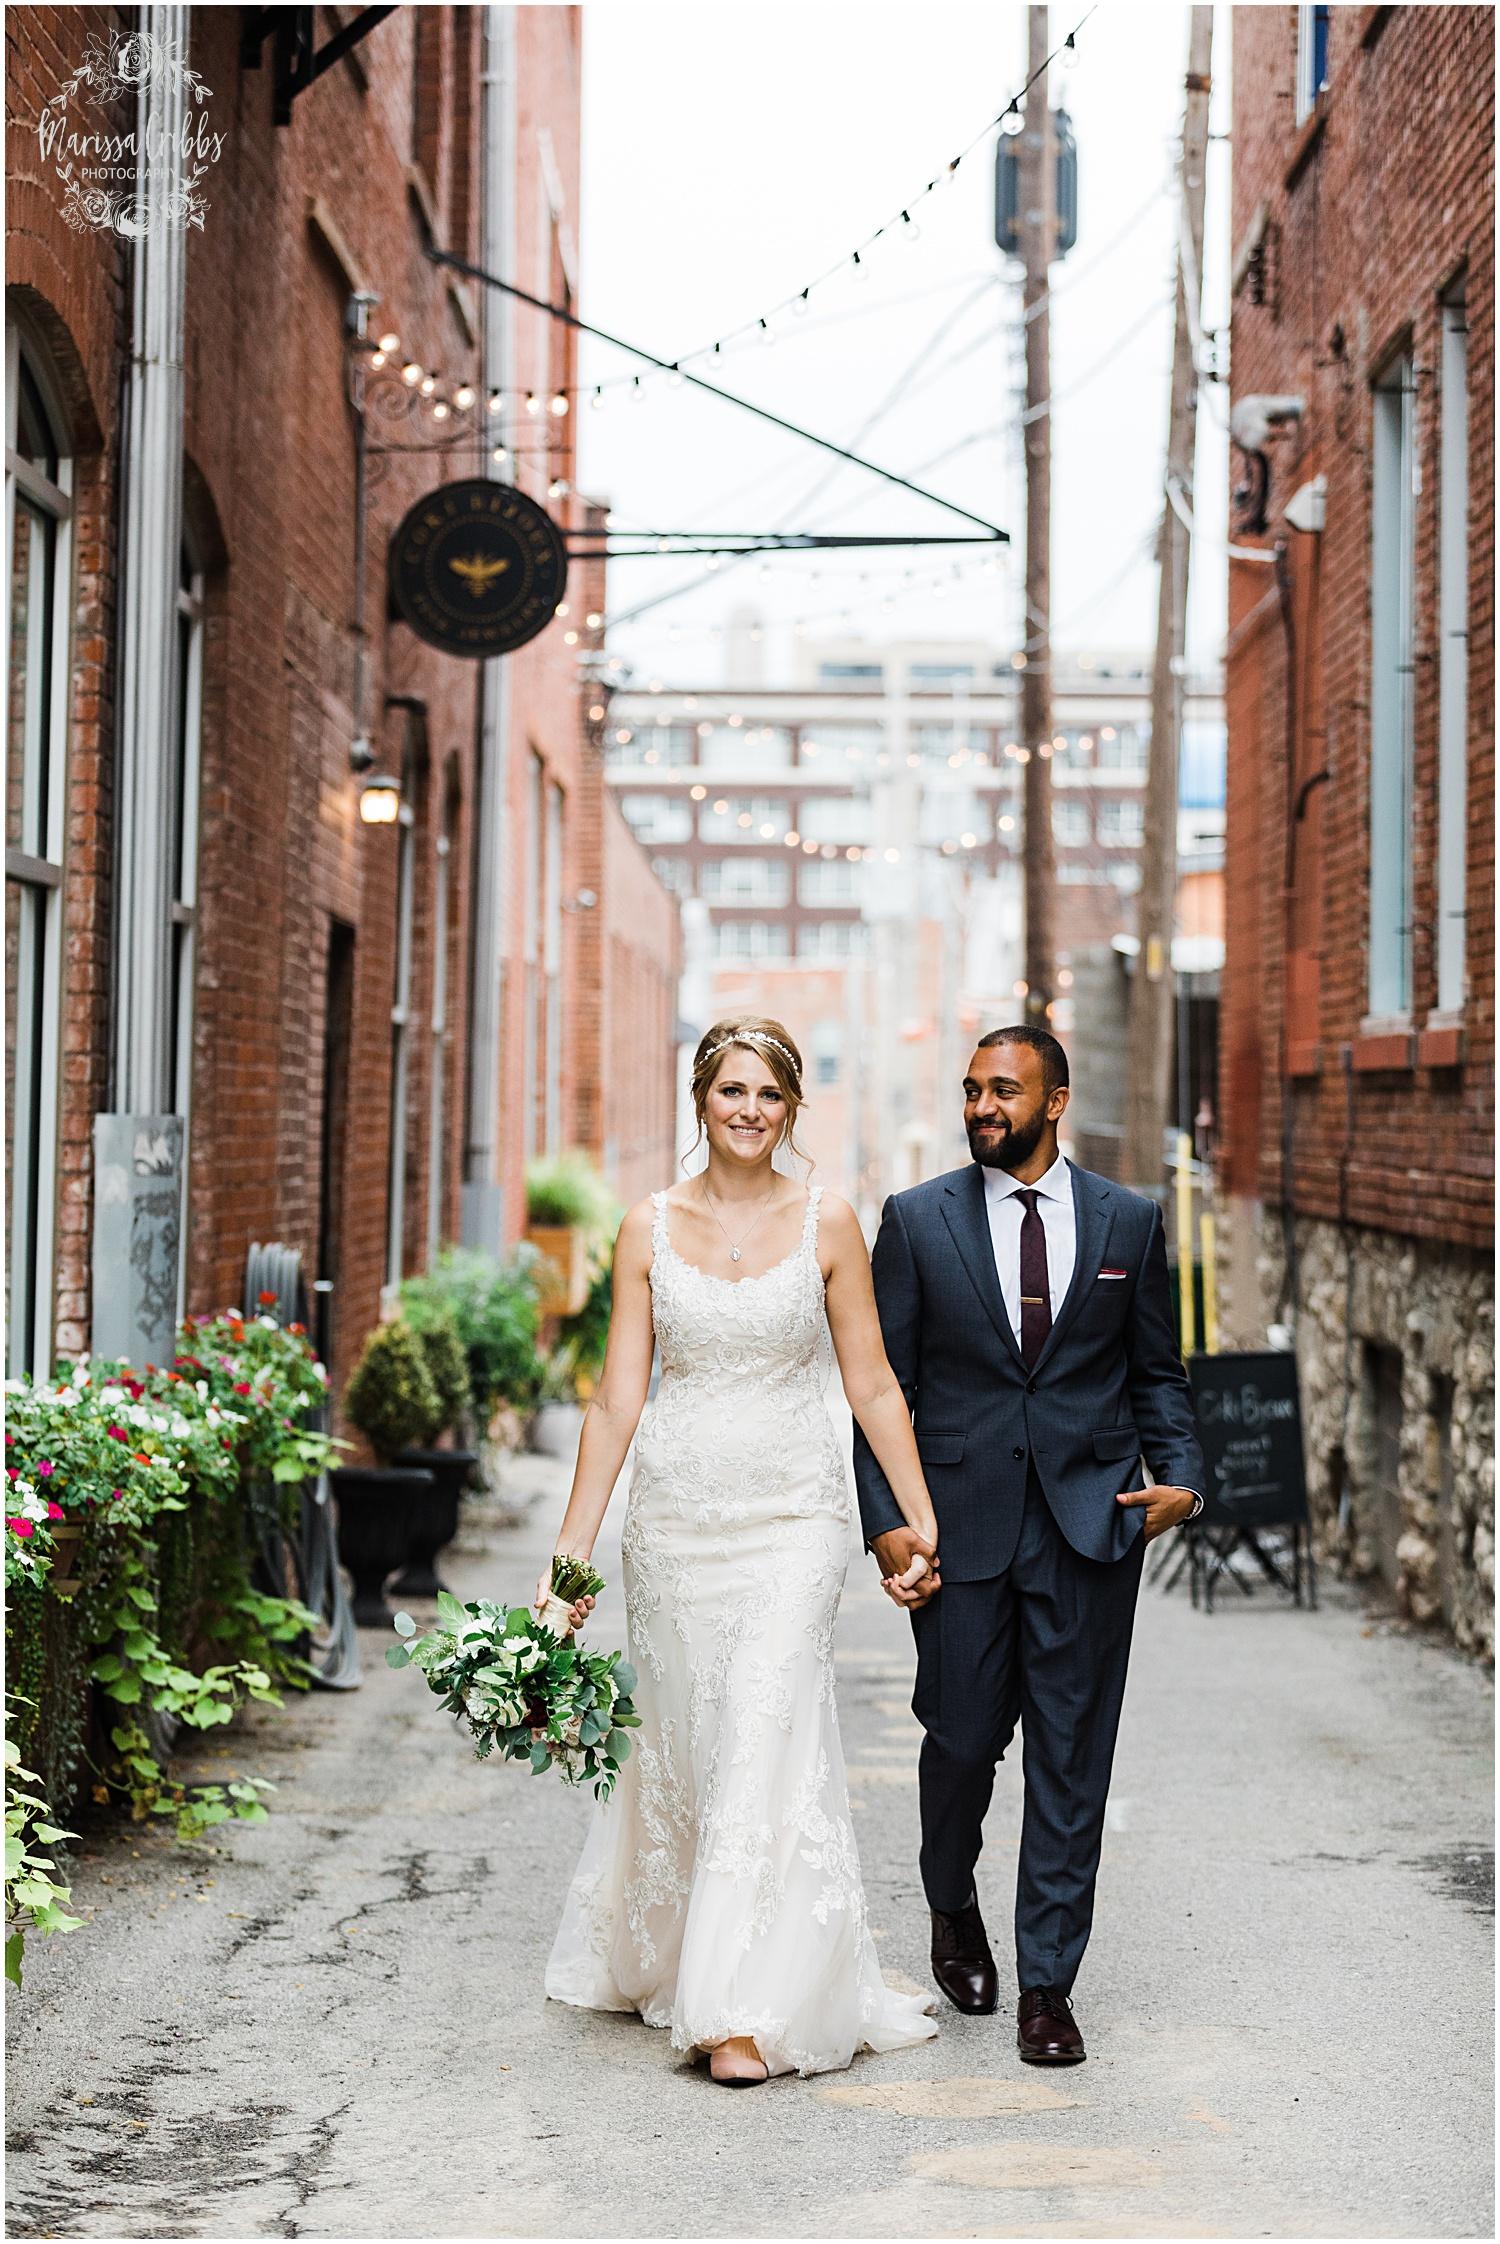 BAUER WEDDING   KELSEA & JUSTIN   MARISSA CRIBBS PHOTOGRAPHY_6565.jpg